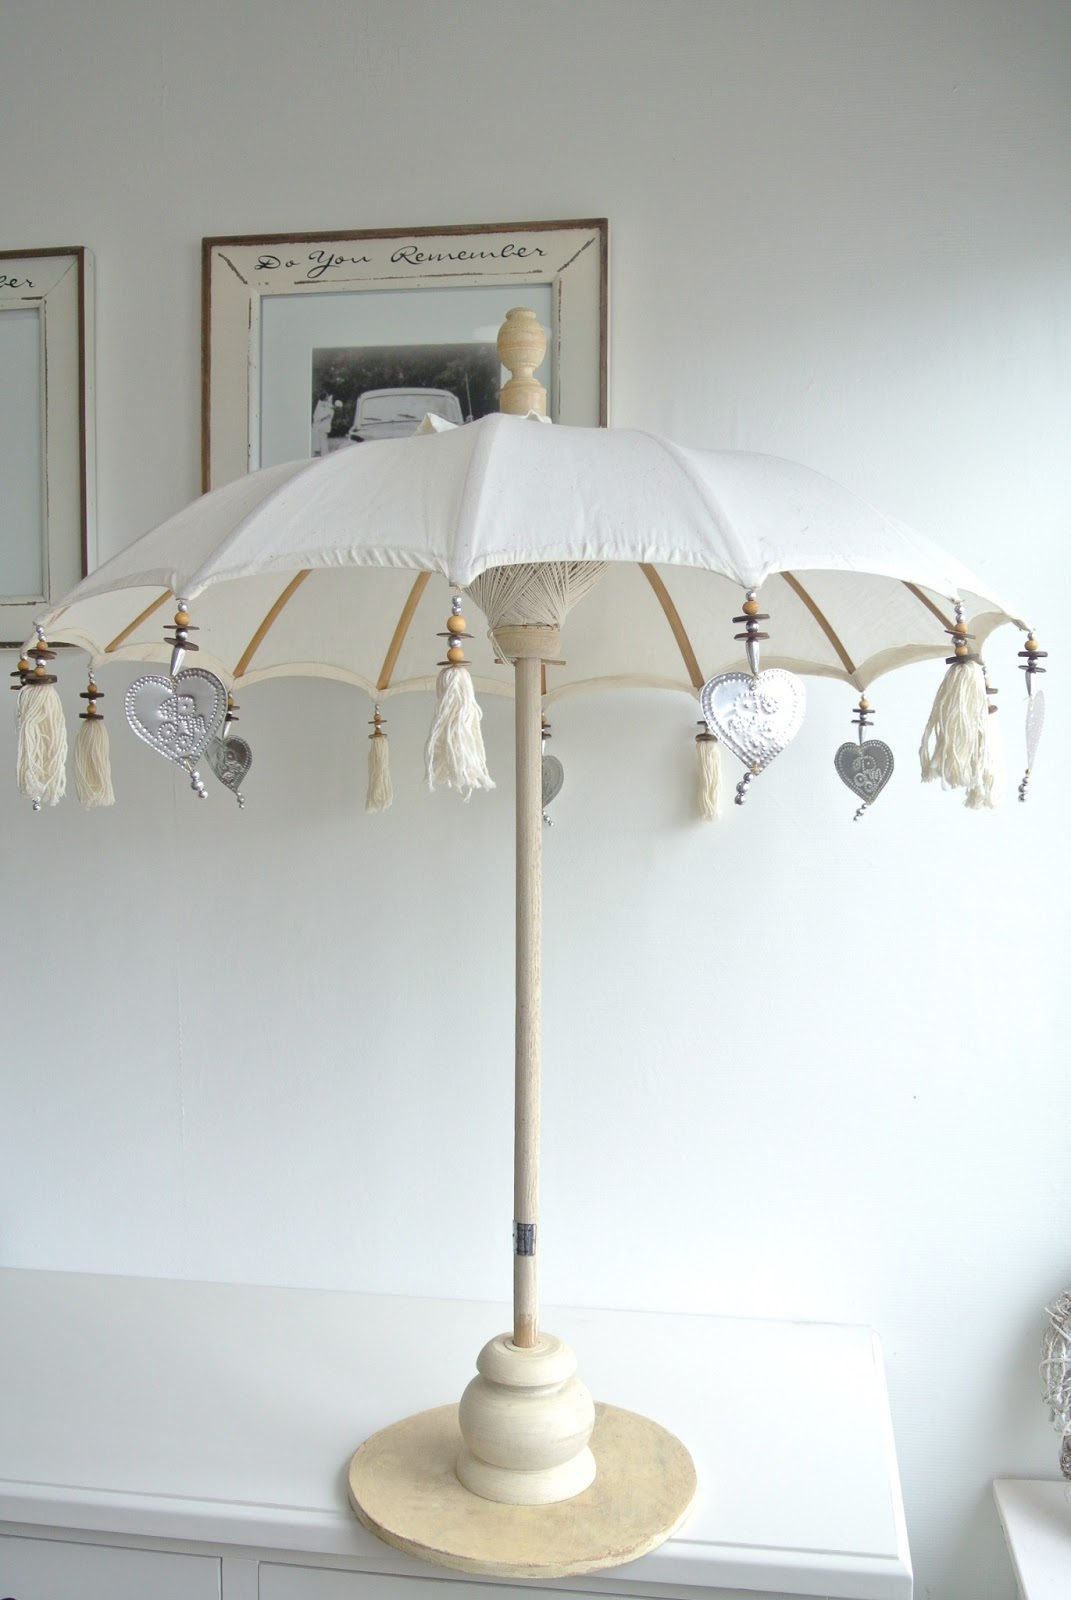 riviera maison tafel parasol halve parasol. Black Bedroom Furniture Sets. Home Design Ideas